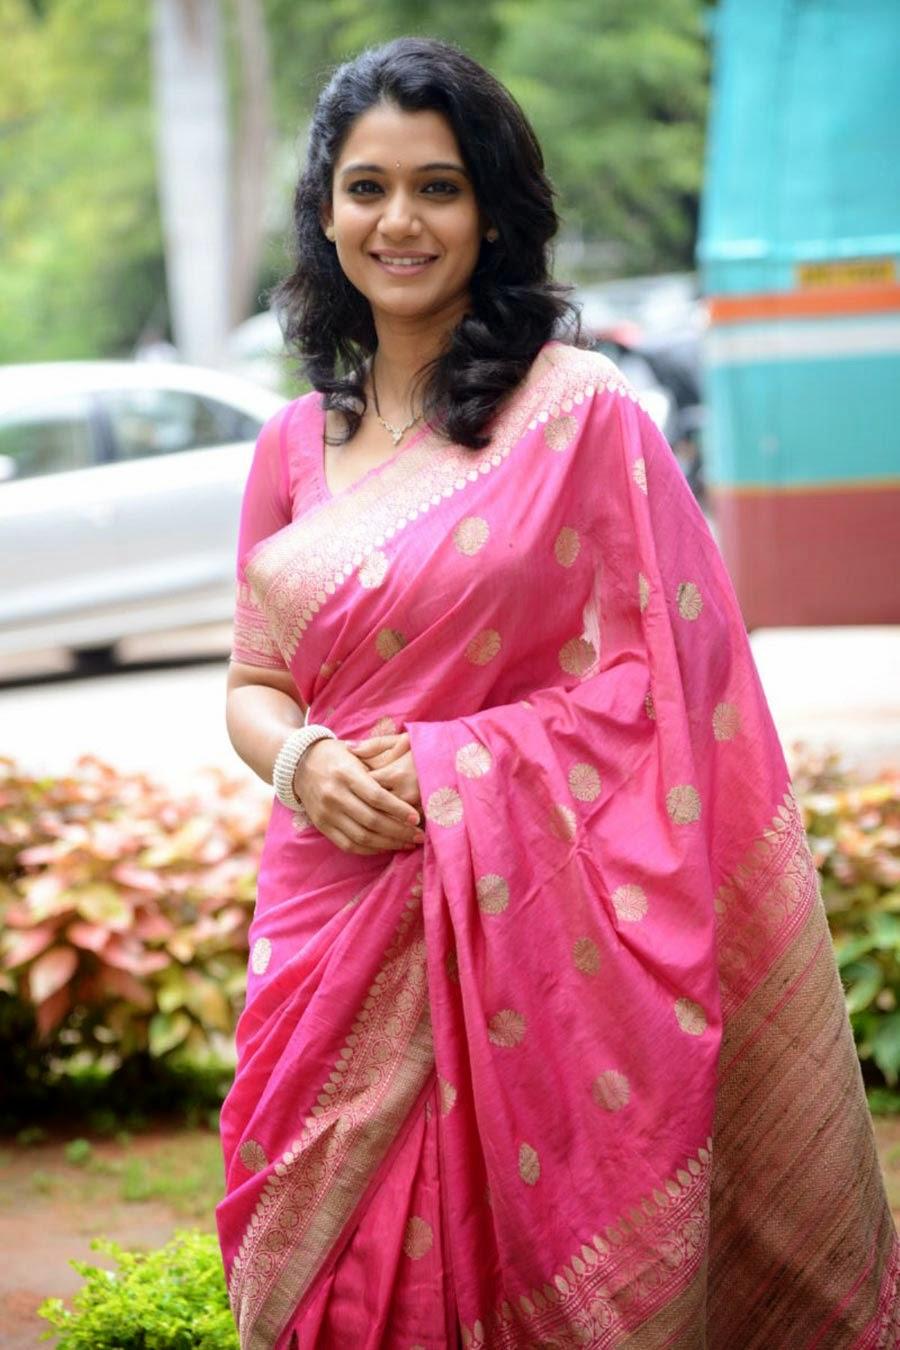 Urmila Kanitkar-Kothare Marathi Actress Photos,Biography